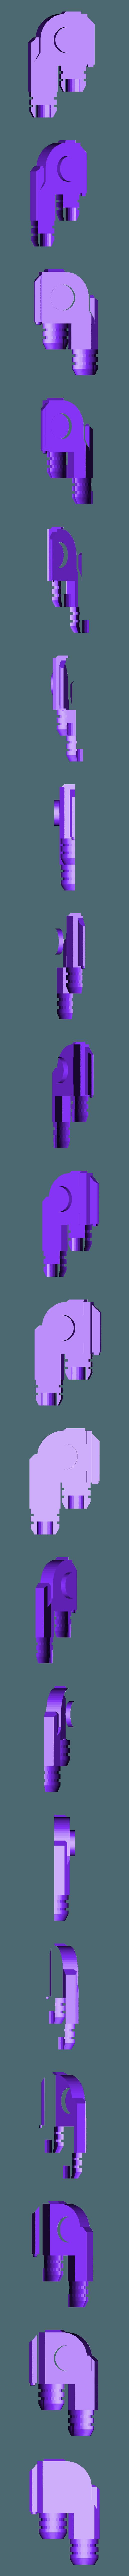 Gun_Right._Bottom.stl Download free STL file Interstellar Army - Quad Mortar and Quad Cannon • 3D printing model, Cikkirock